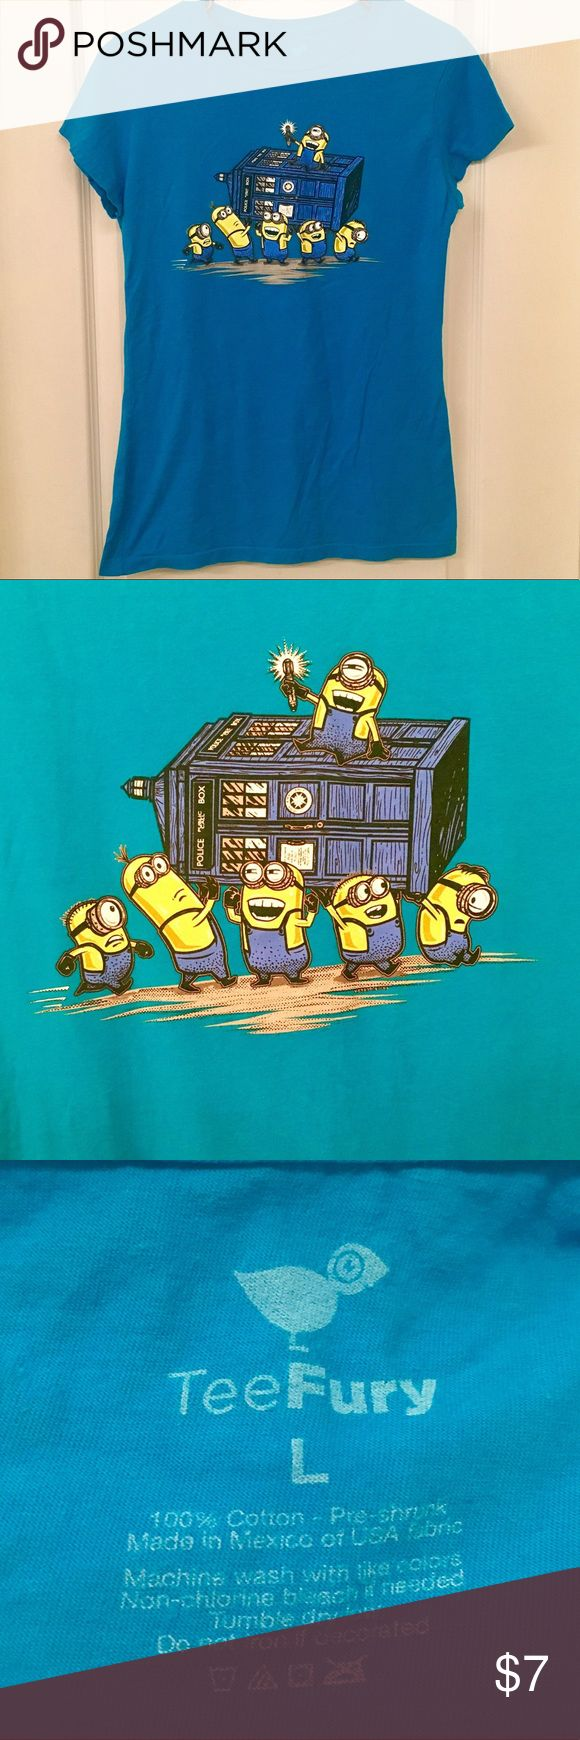 🦋Adorable Minion Police Box T-Shirt🦋 Adorable Blue Minion Police Box T-shirt !!! Women's size large !! Disney Tops Tees - Short Sleeve